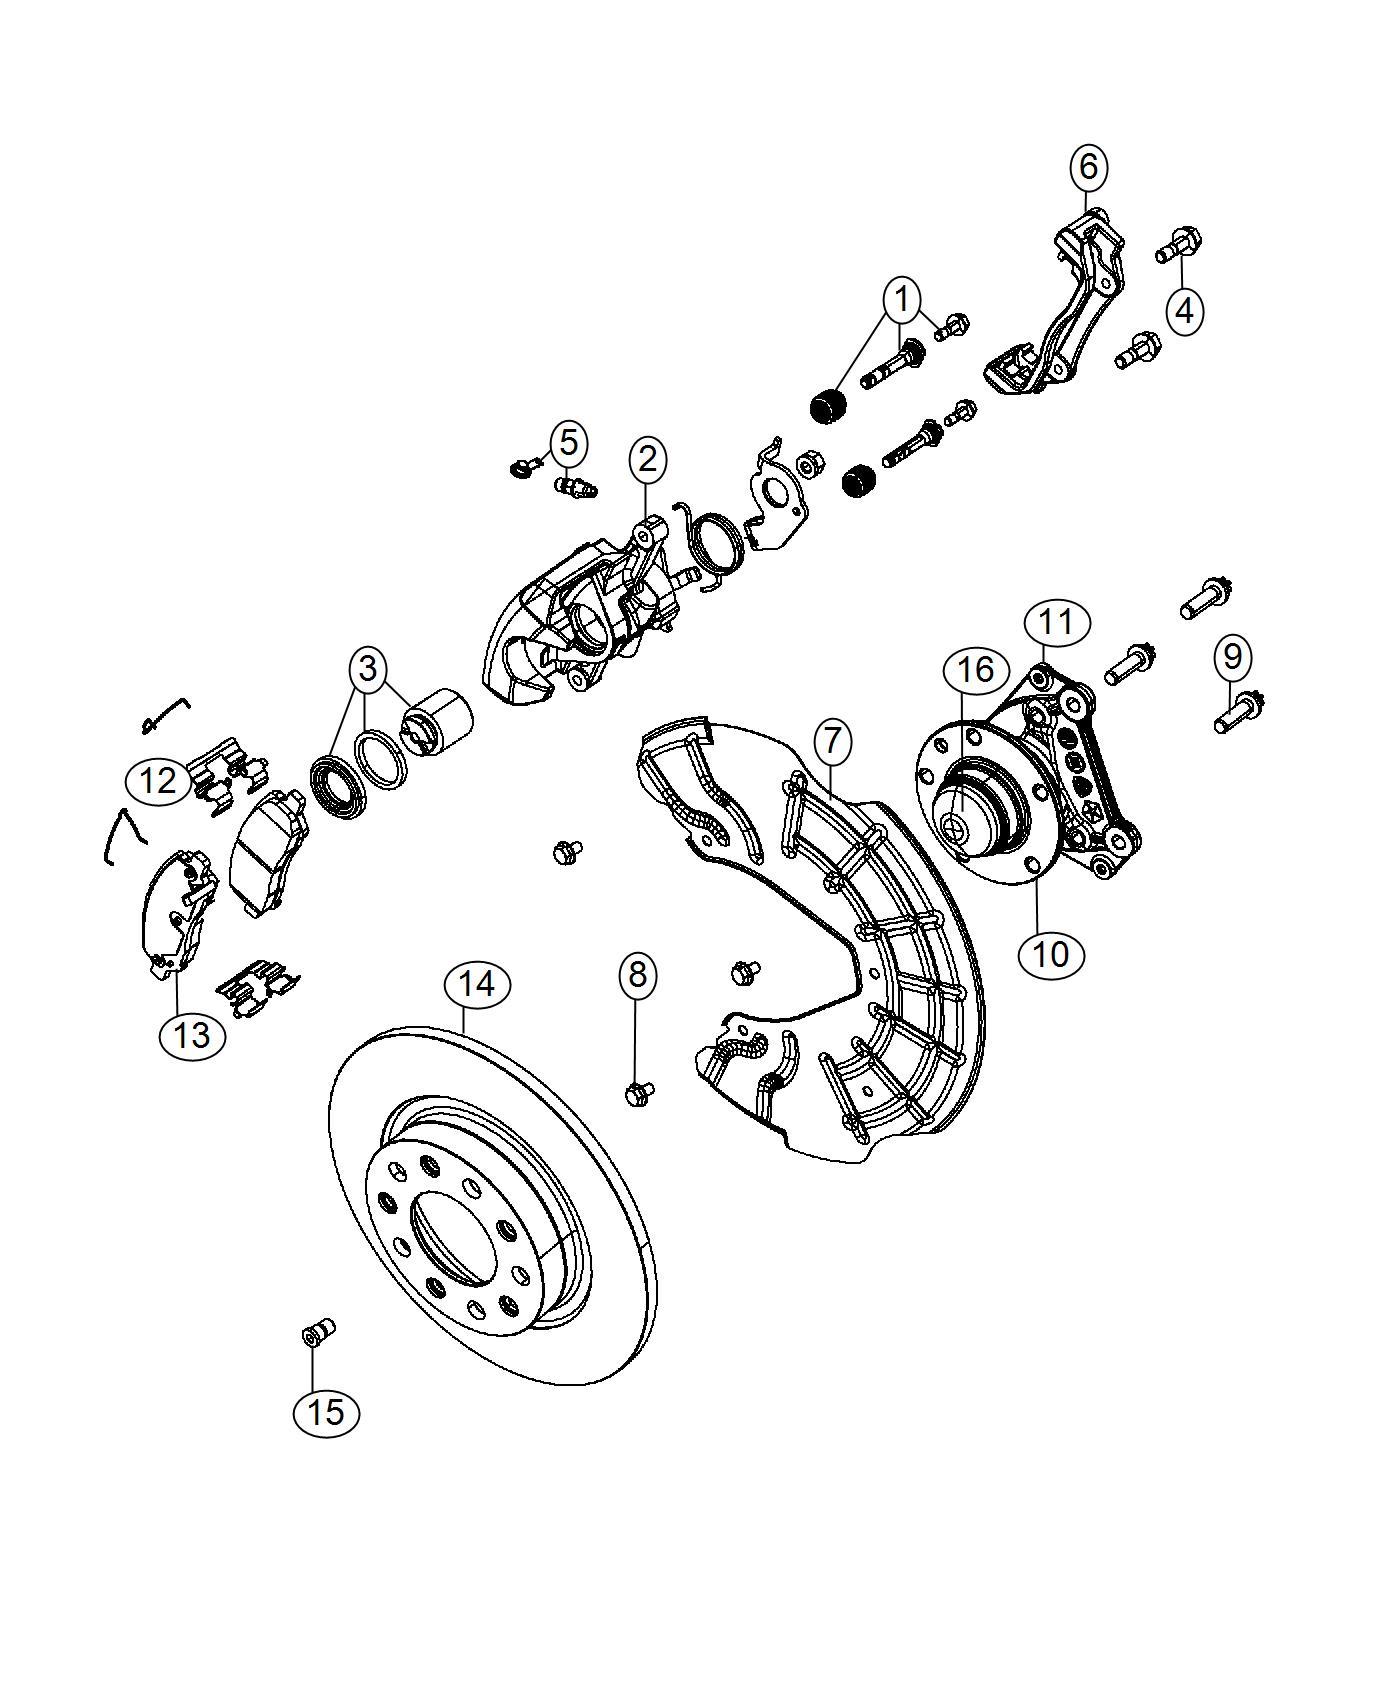 Dodge Dart Caliper Disc Brake Brake And Knuckle Parts